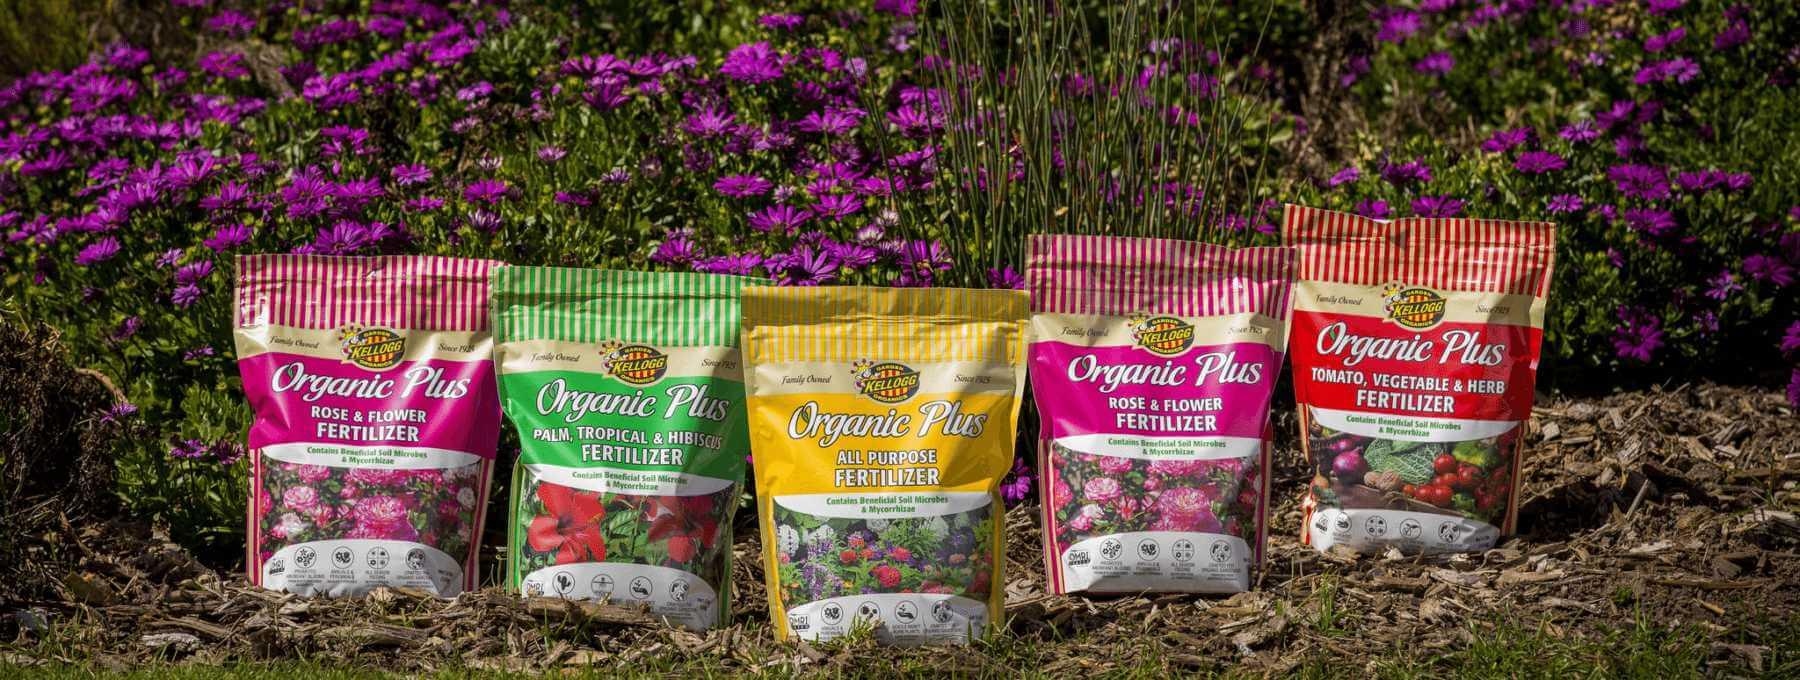 Kellogg organic fertilizer line